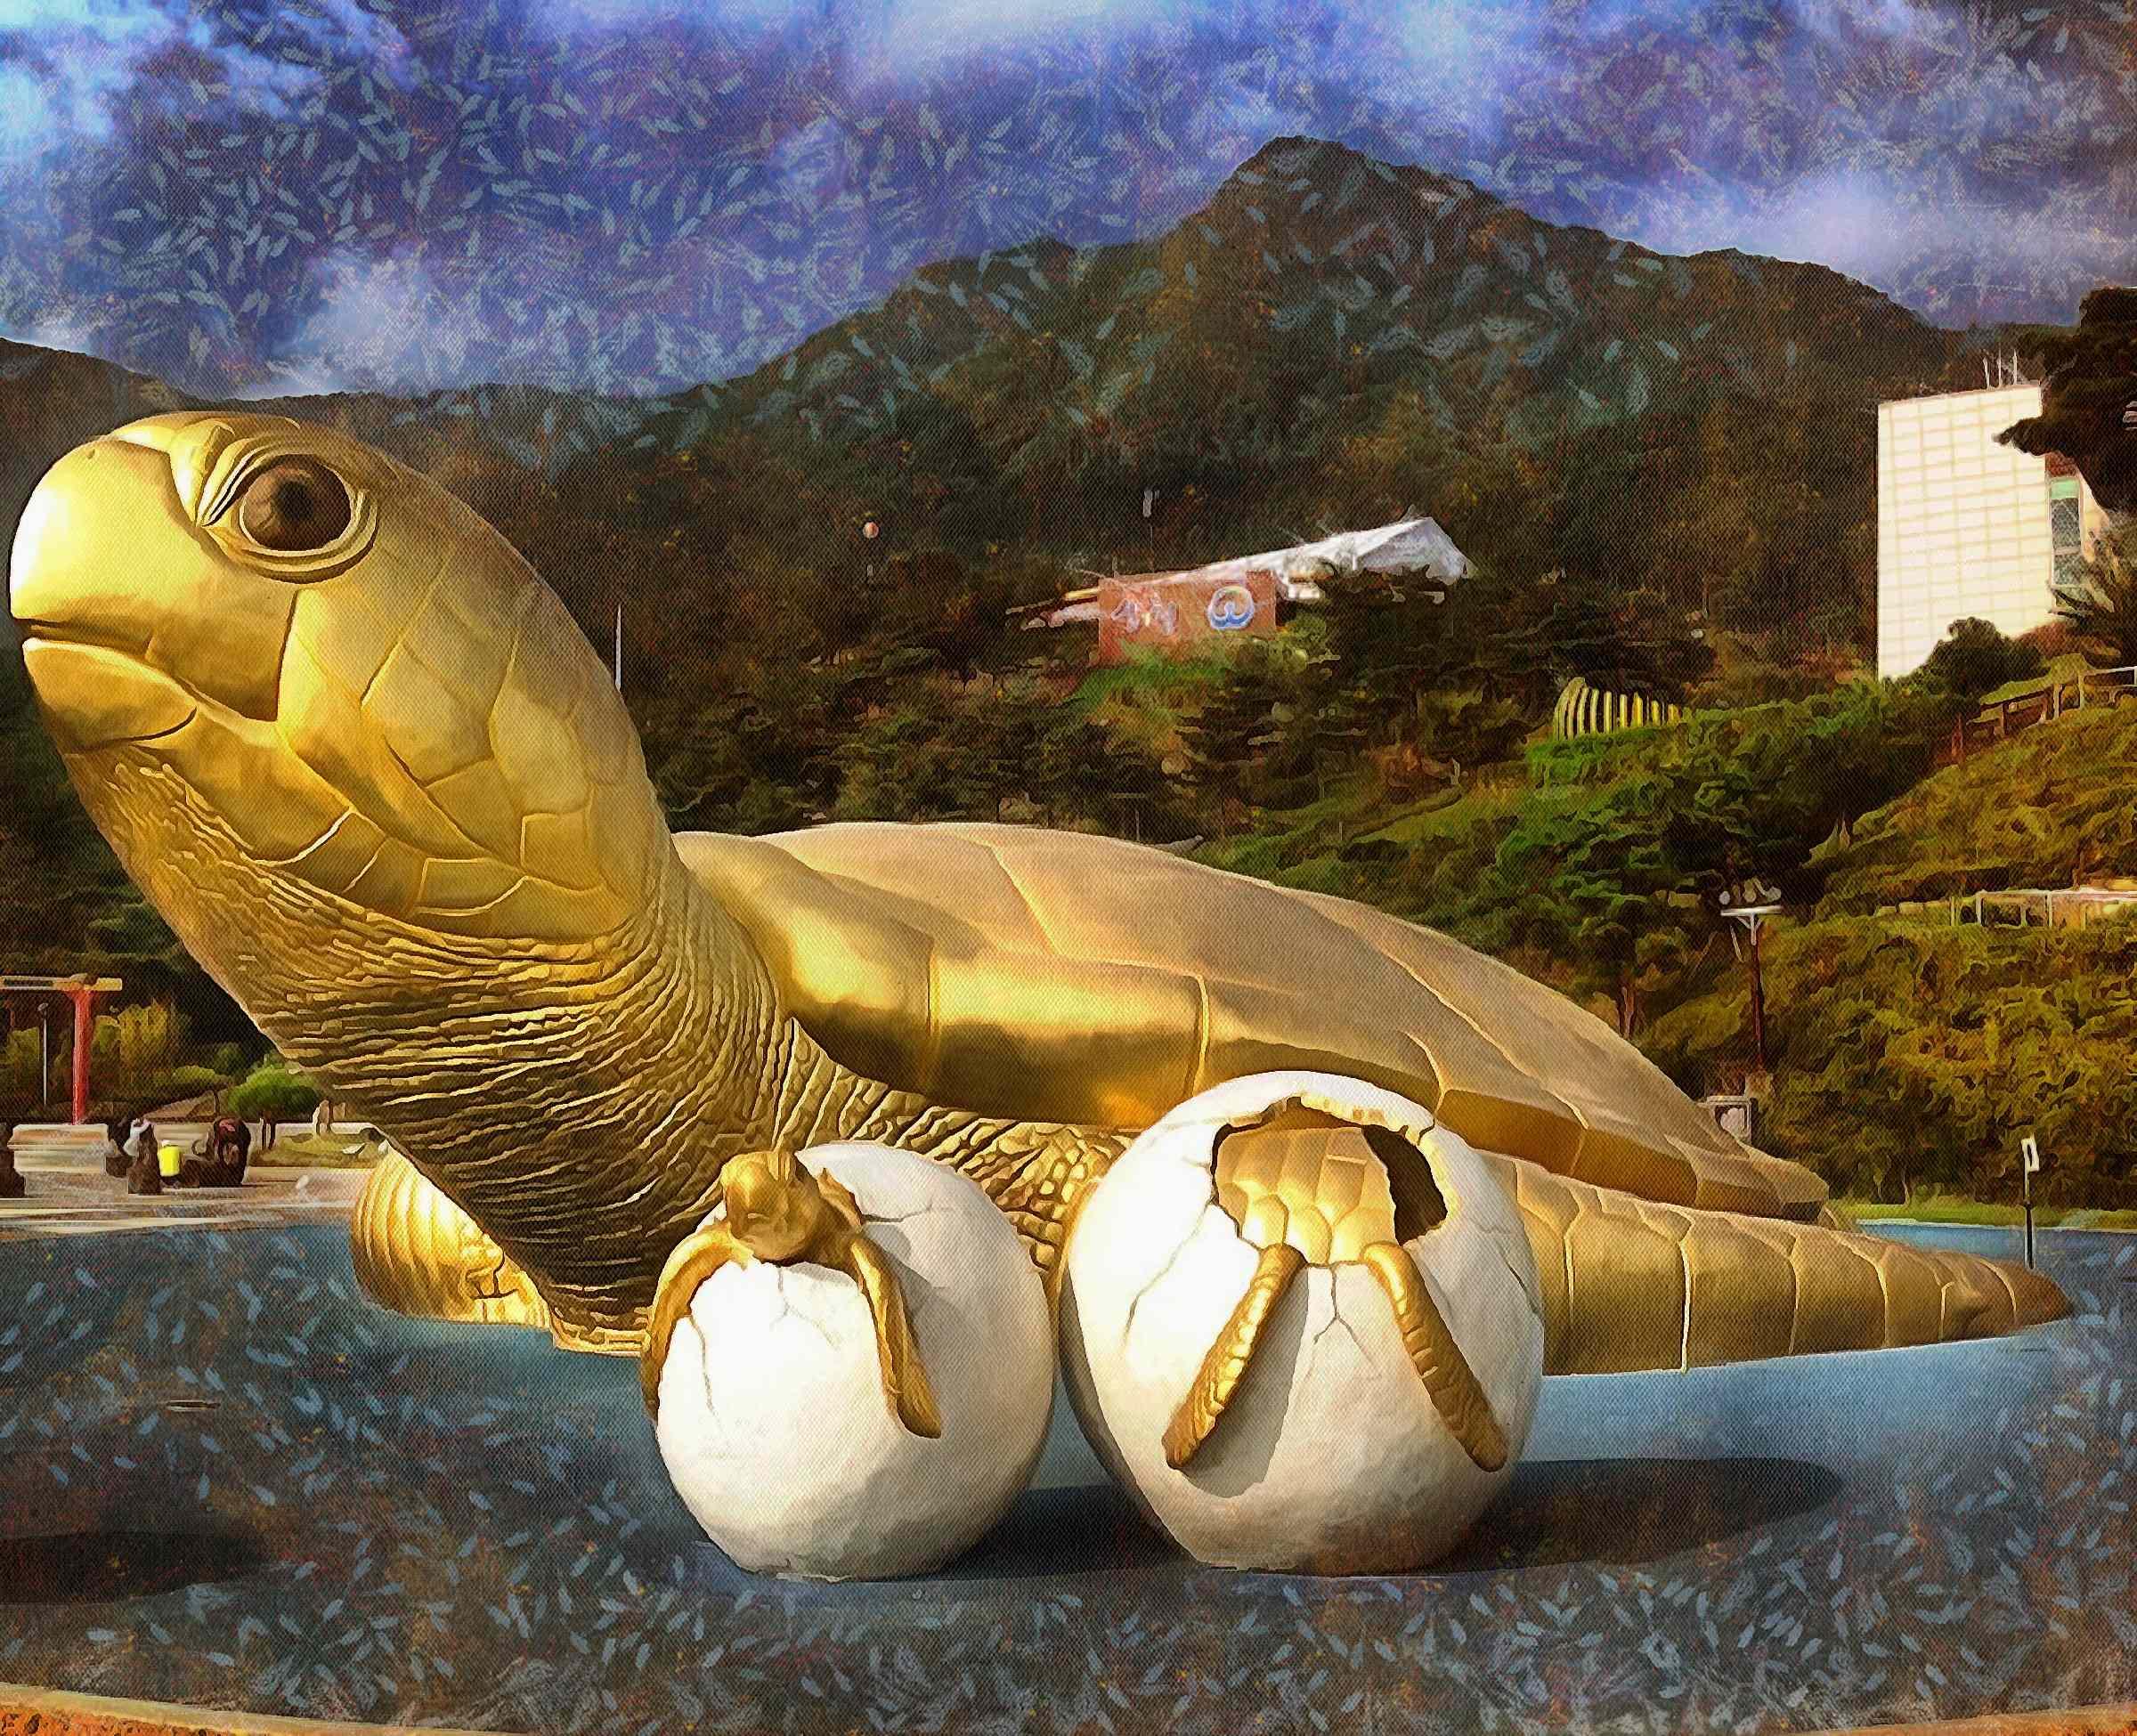 Turtle, tortoise,  loggerhead, terrapin, chelonian, leatherback, – Turtle free images, Tortoise free images, Turtle stock free images, Download free images turtles, turtle public domain images, tortoise public domain images!